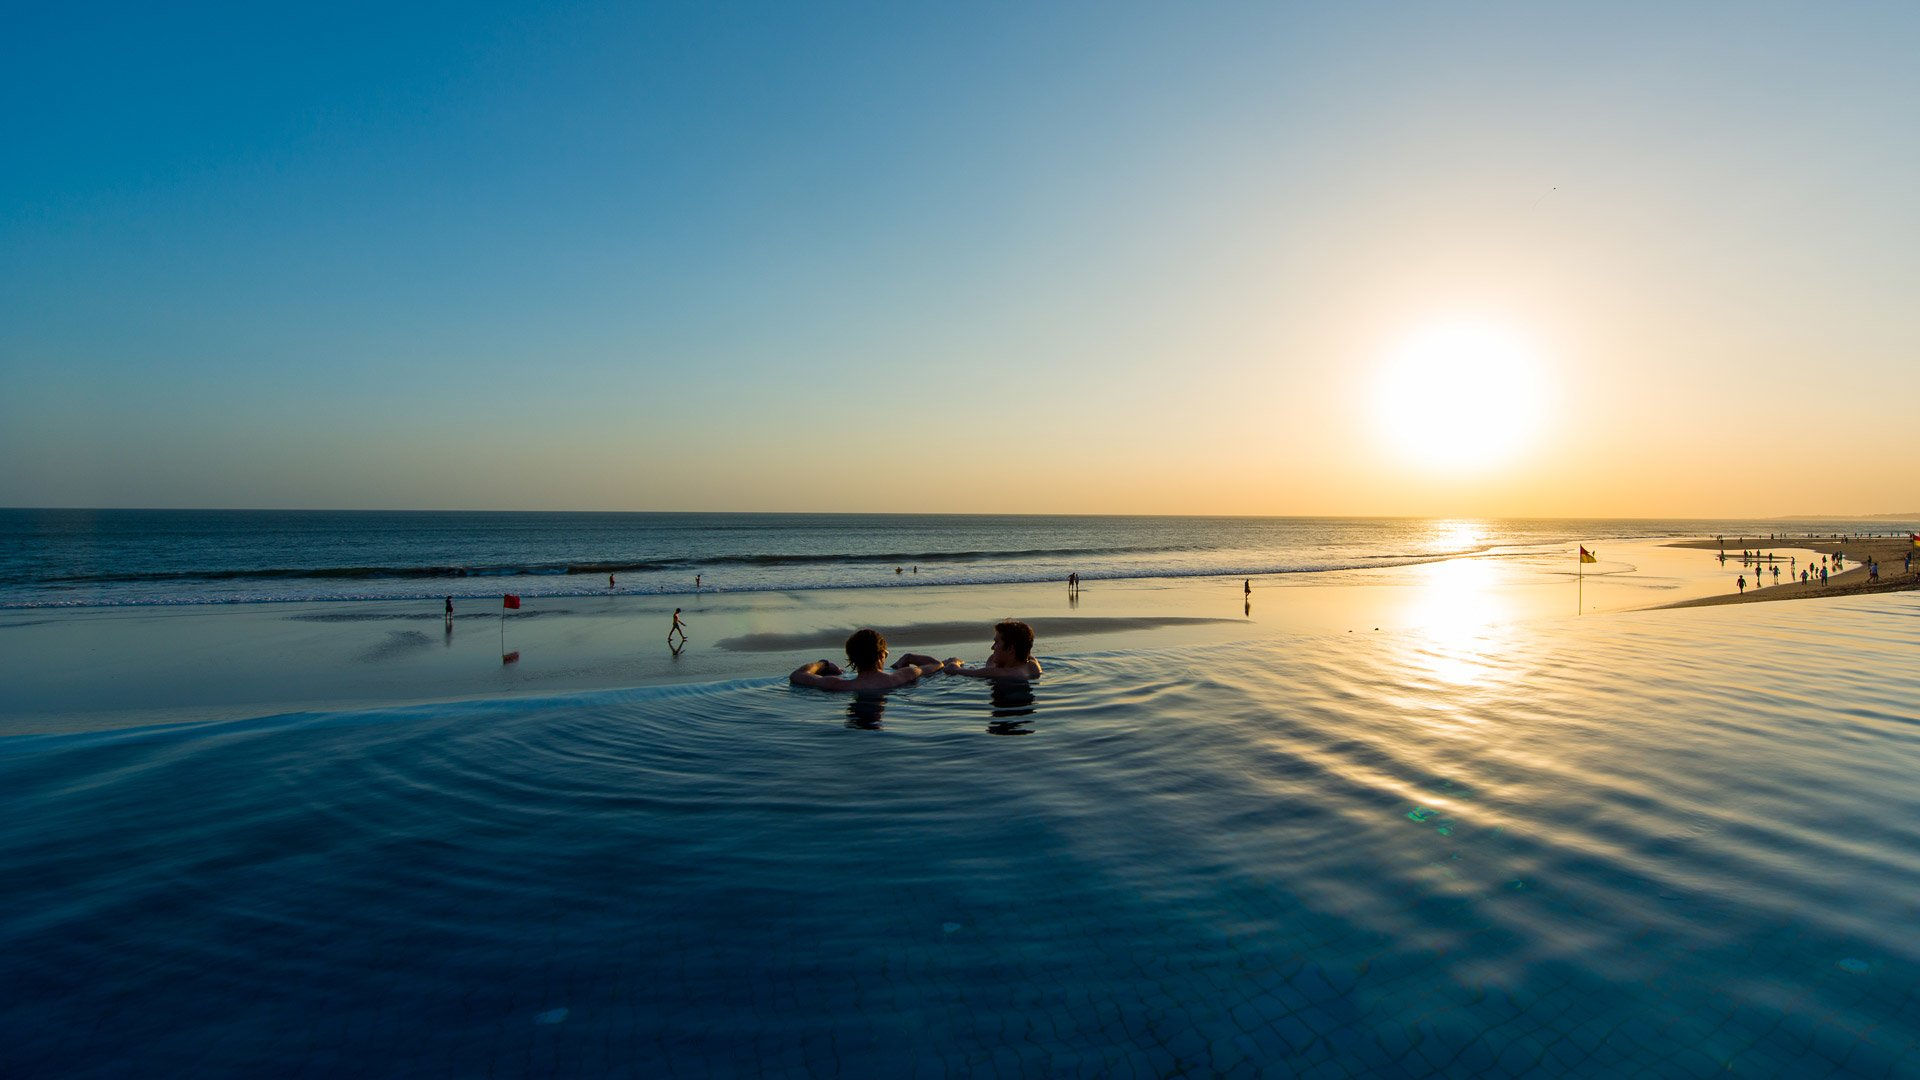 Exterior: Luxury Hotel In Bali